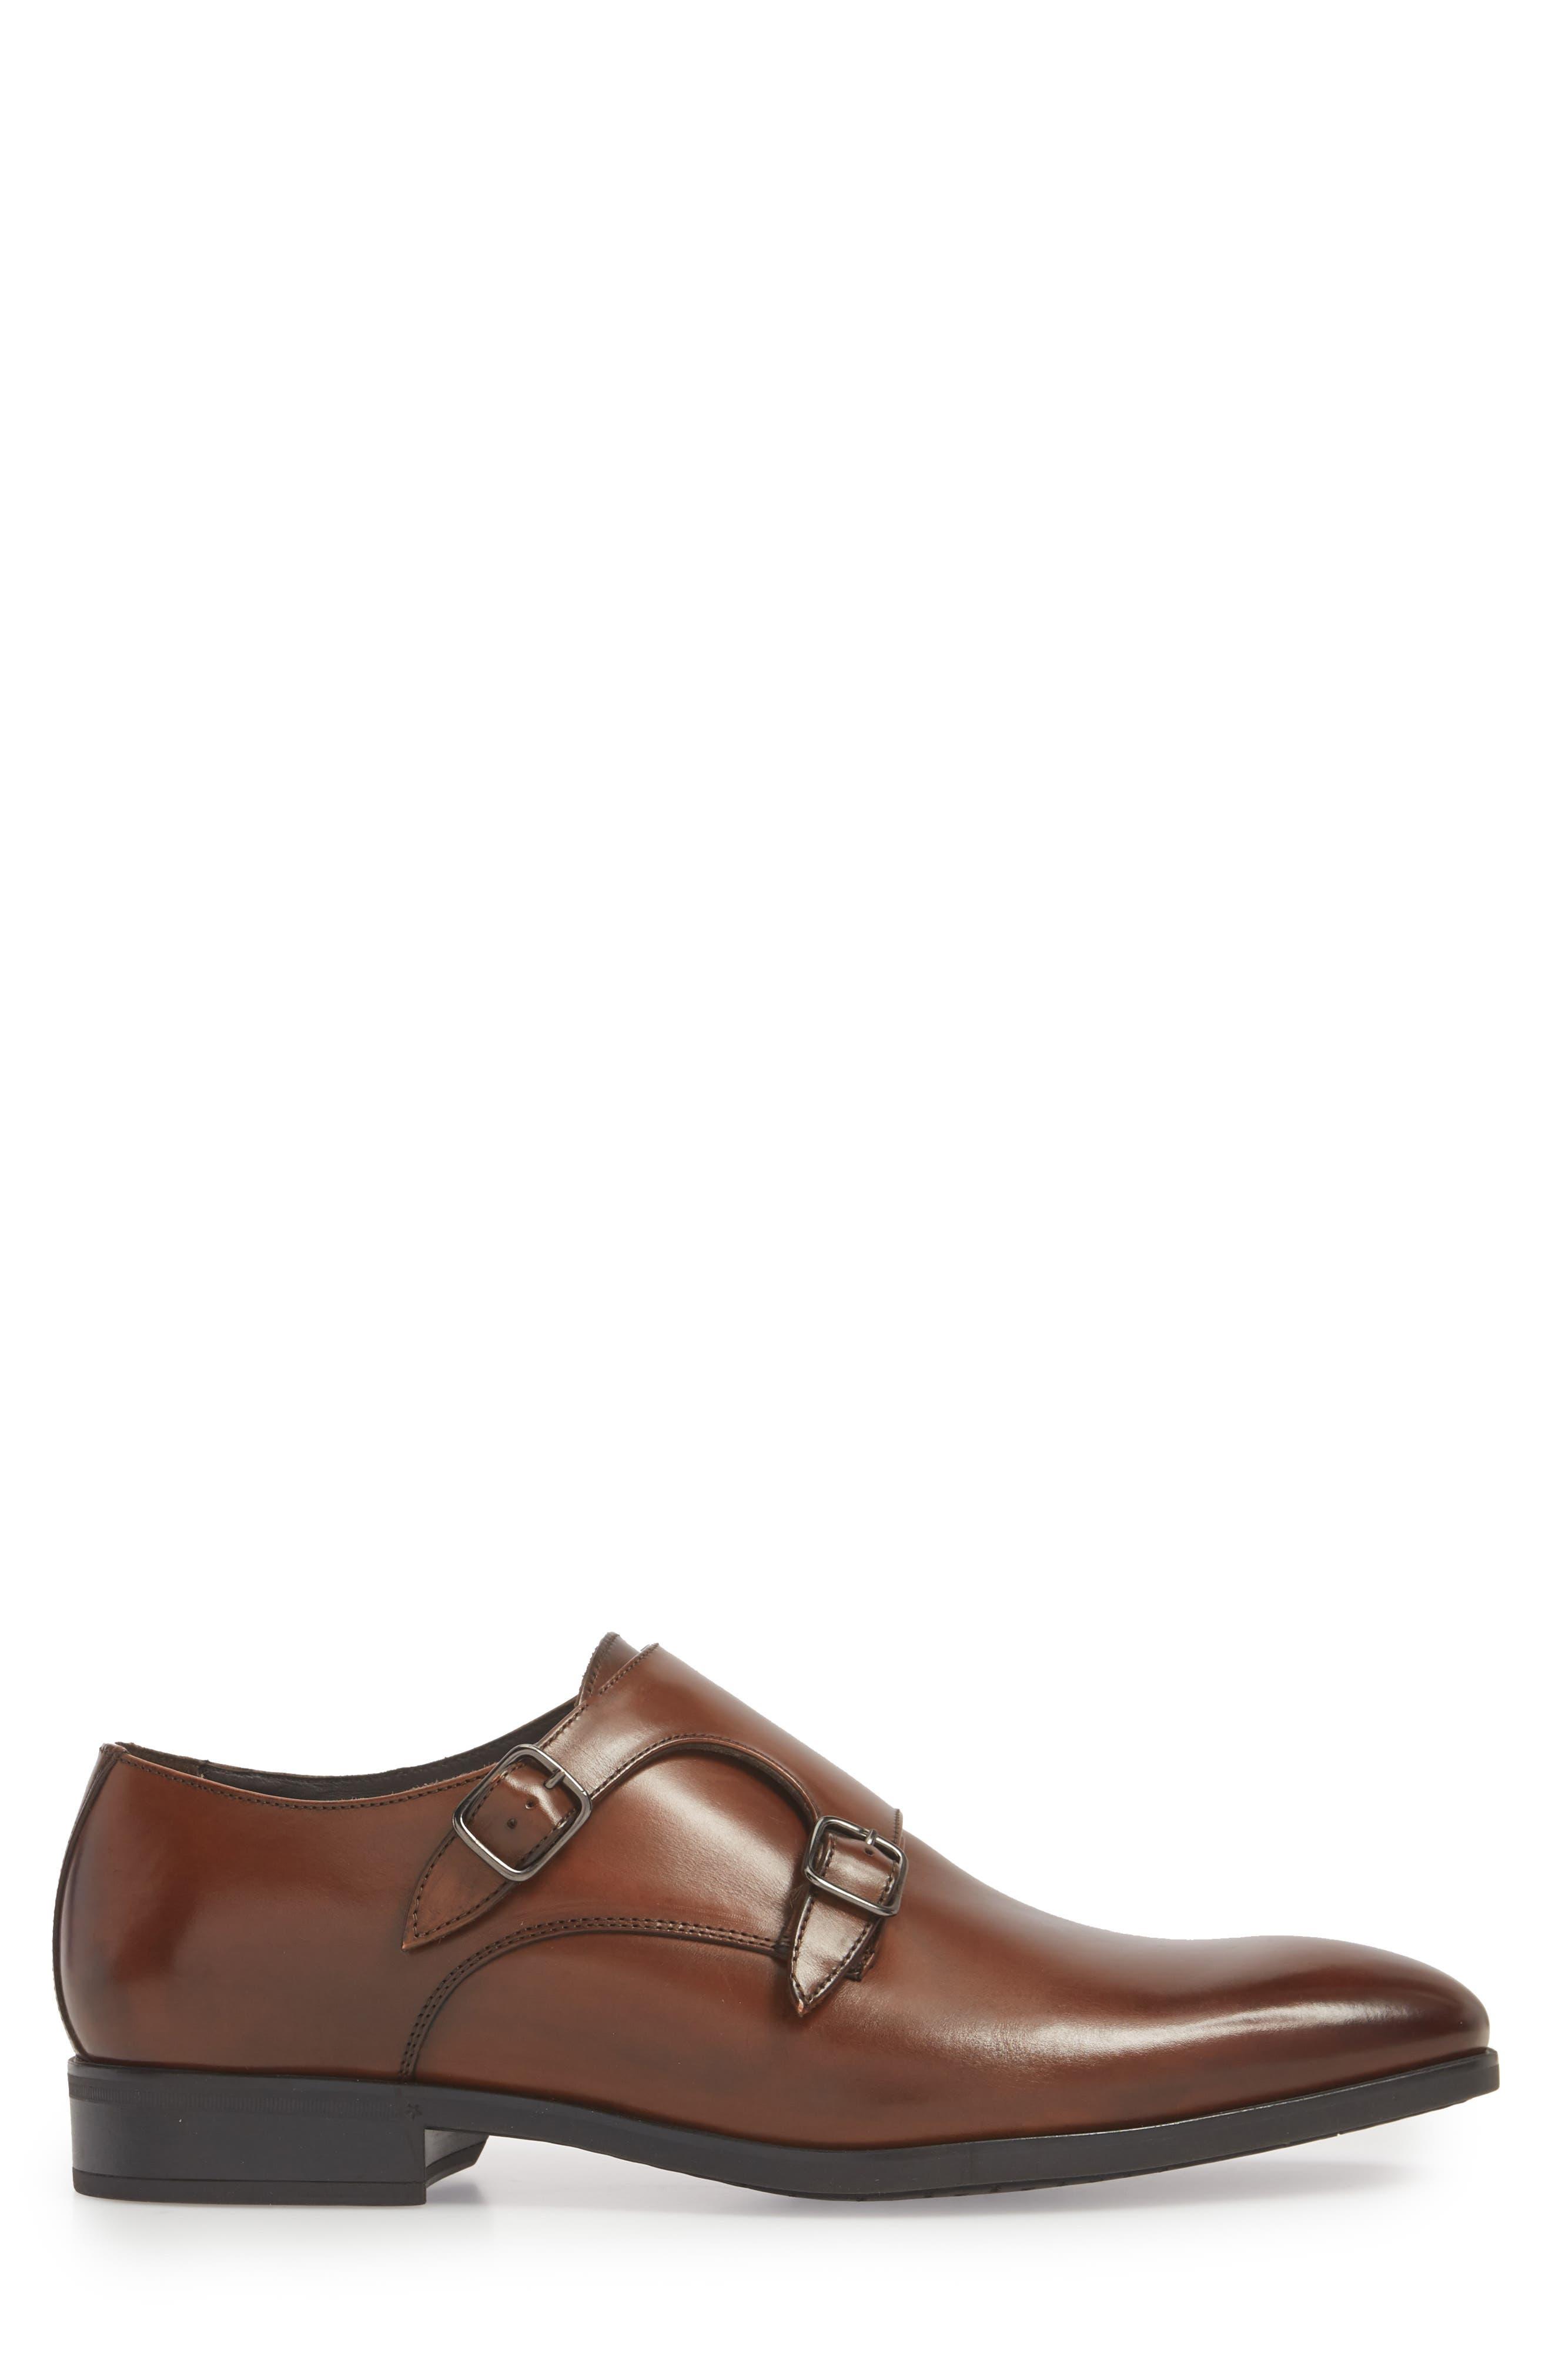 Benjamin Double Monk Strap Shoe,                             Alternate thumbnail 3, color,                             TMORO LEATHER